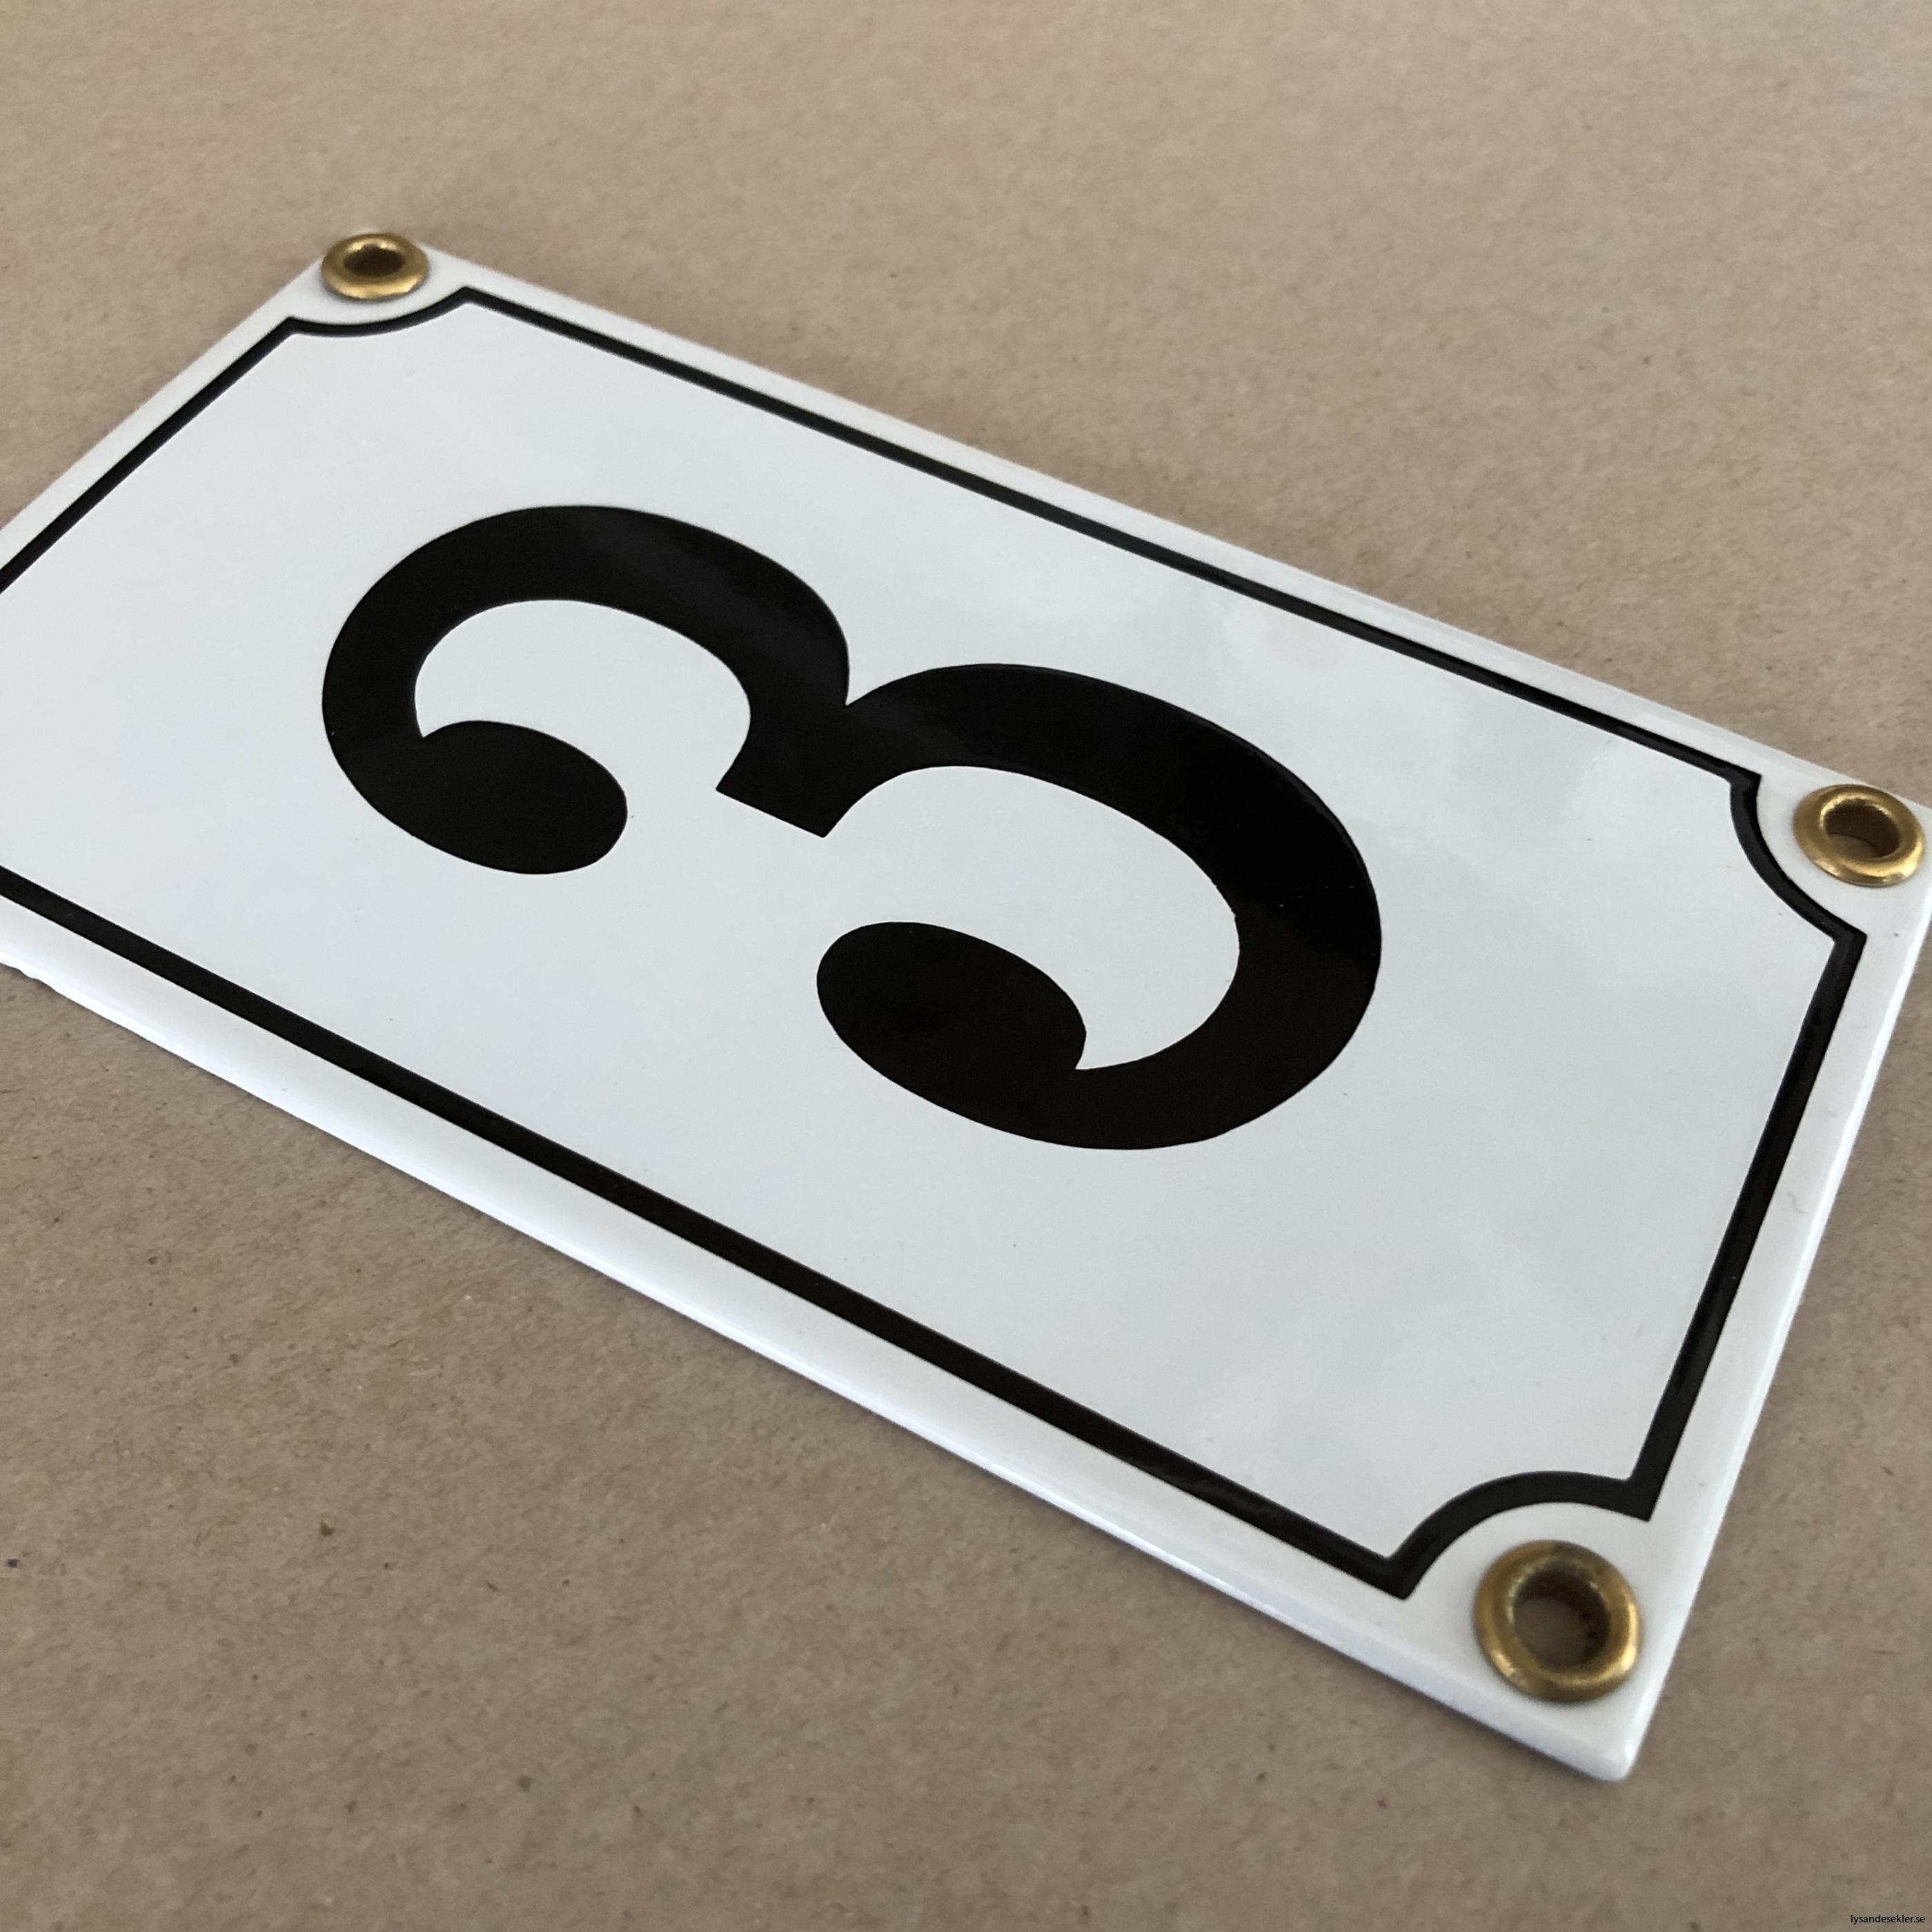 emaljsiffra siffra i emalj fasadsiffra nummer7